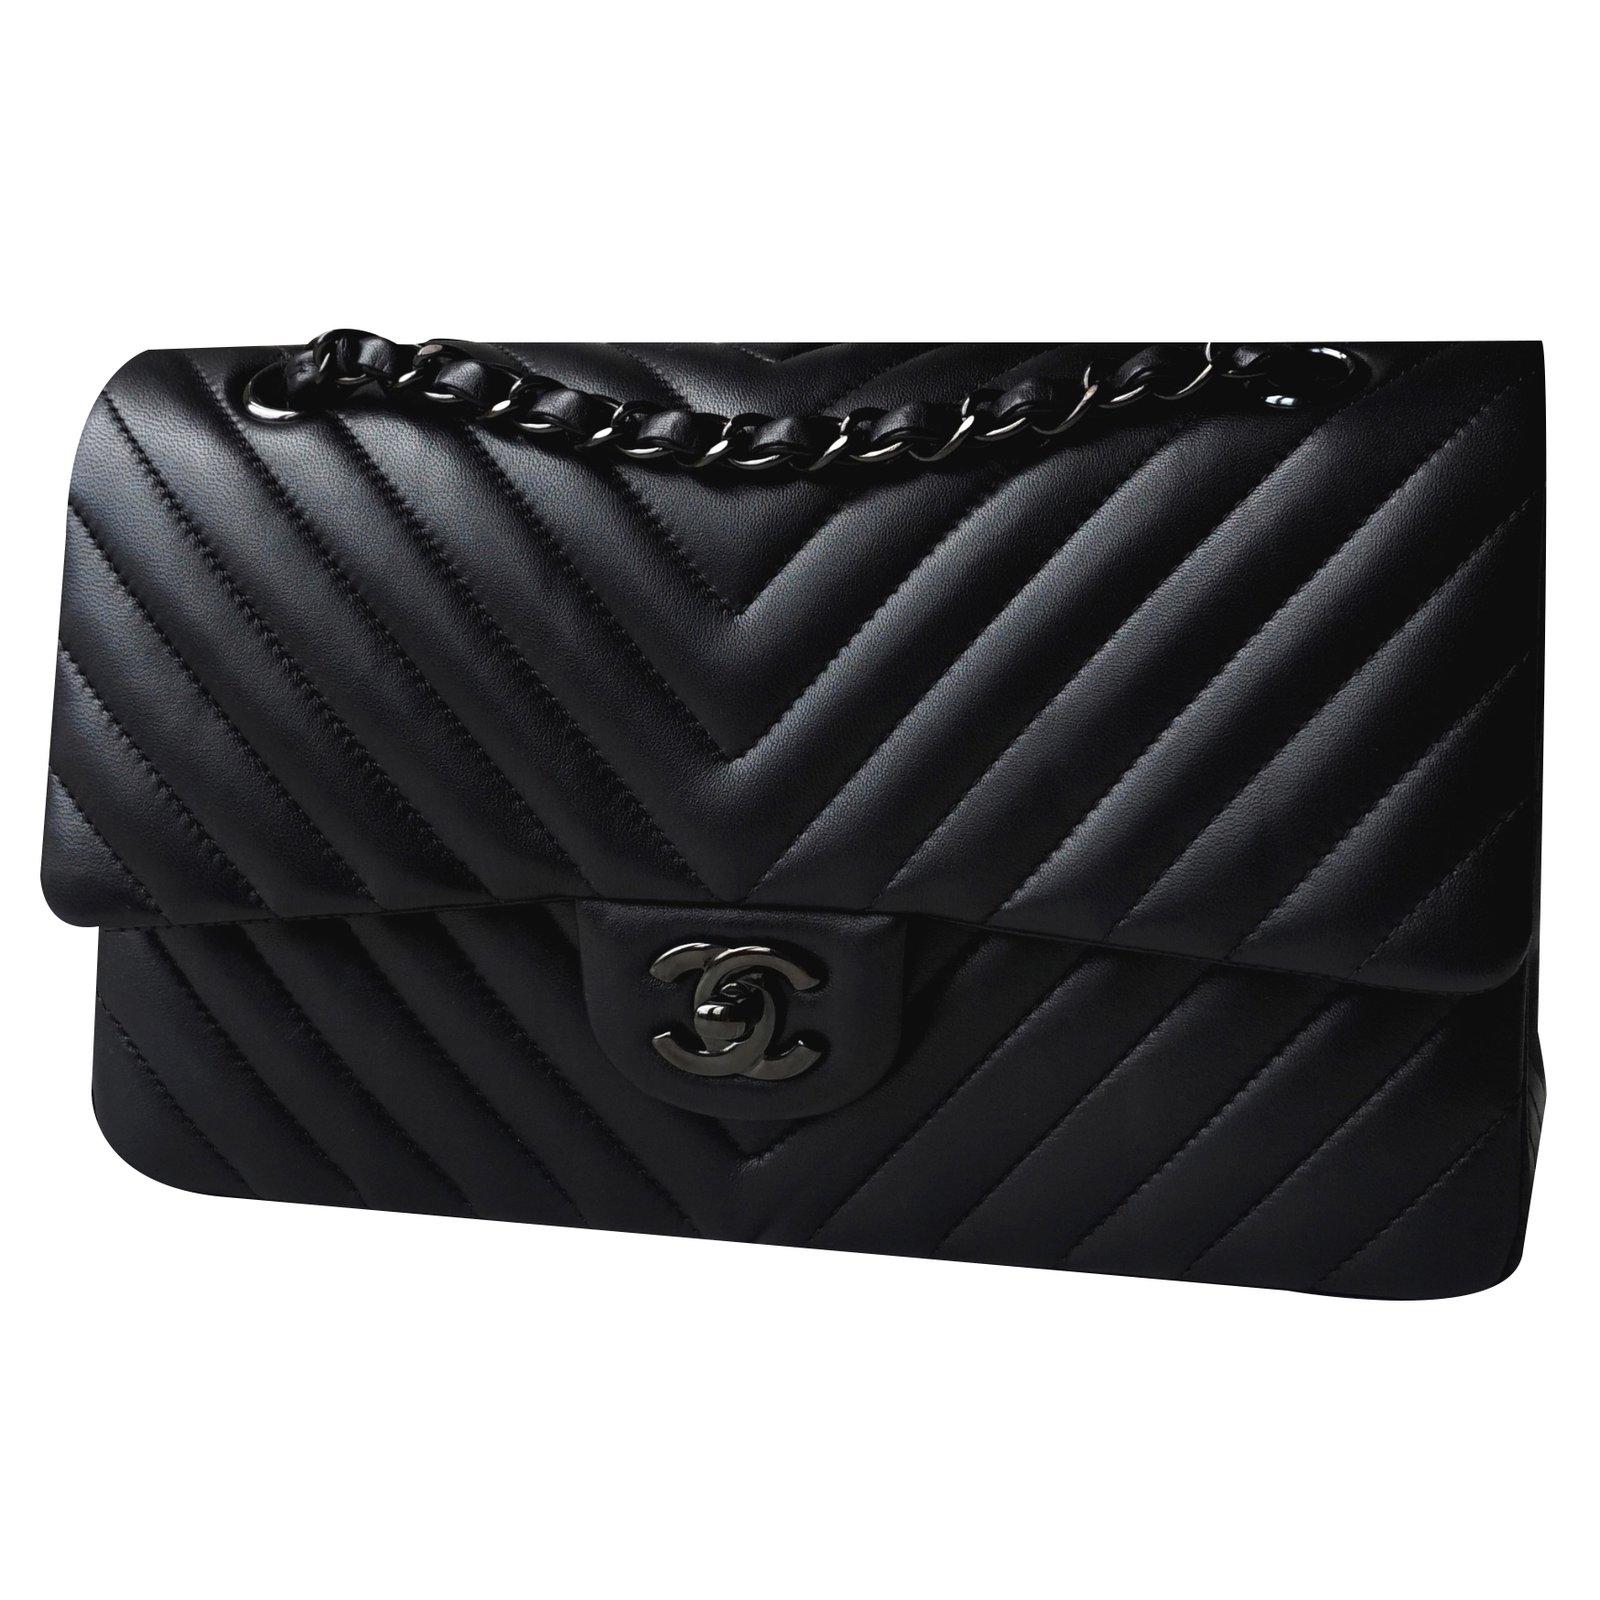 b03e9993d78 Chanel Timeless So Black Handbags Lambskin Ref 20645 Joli Closet